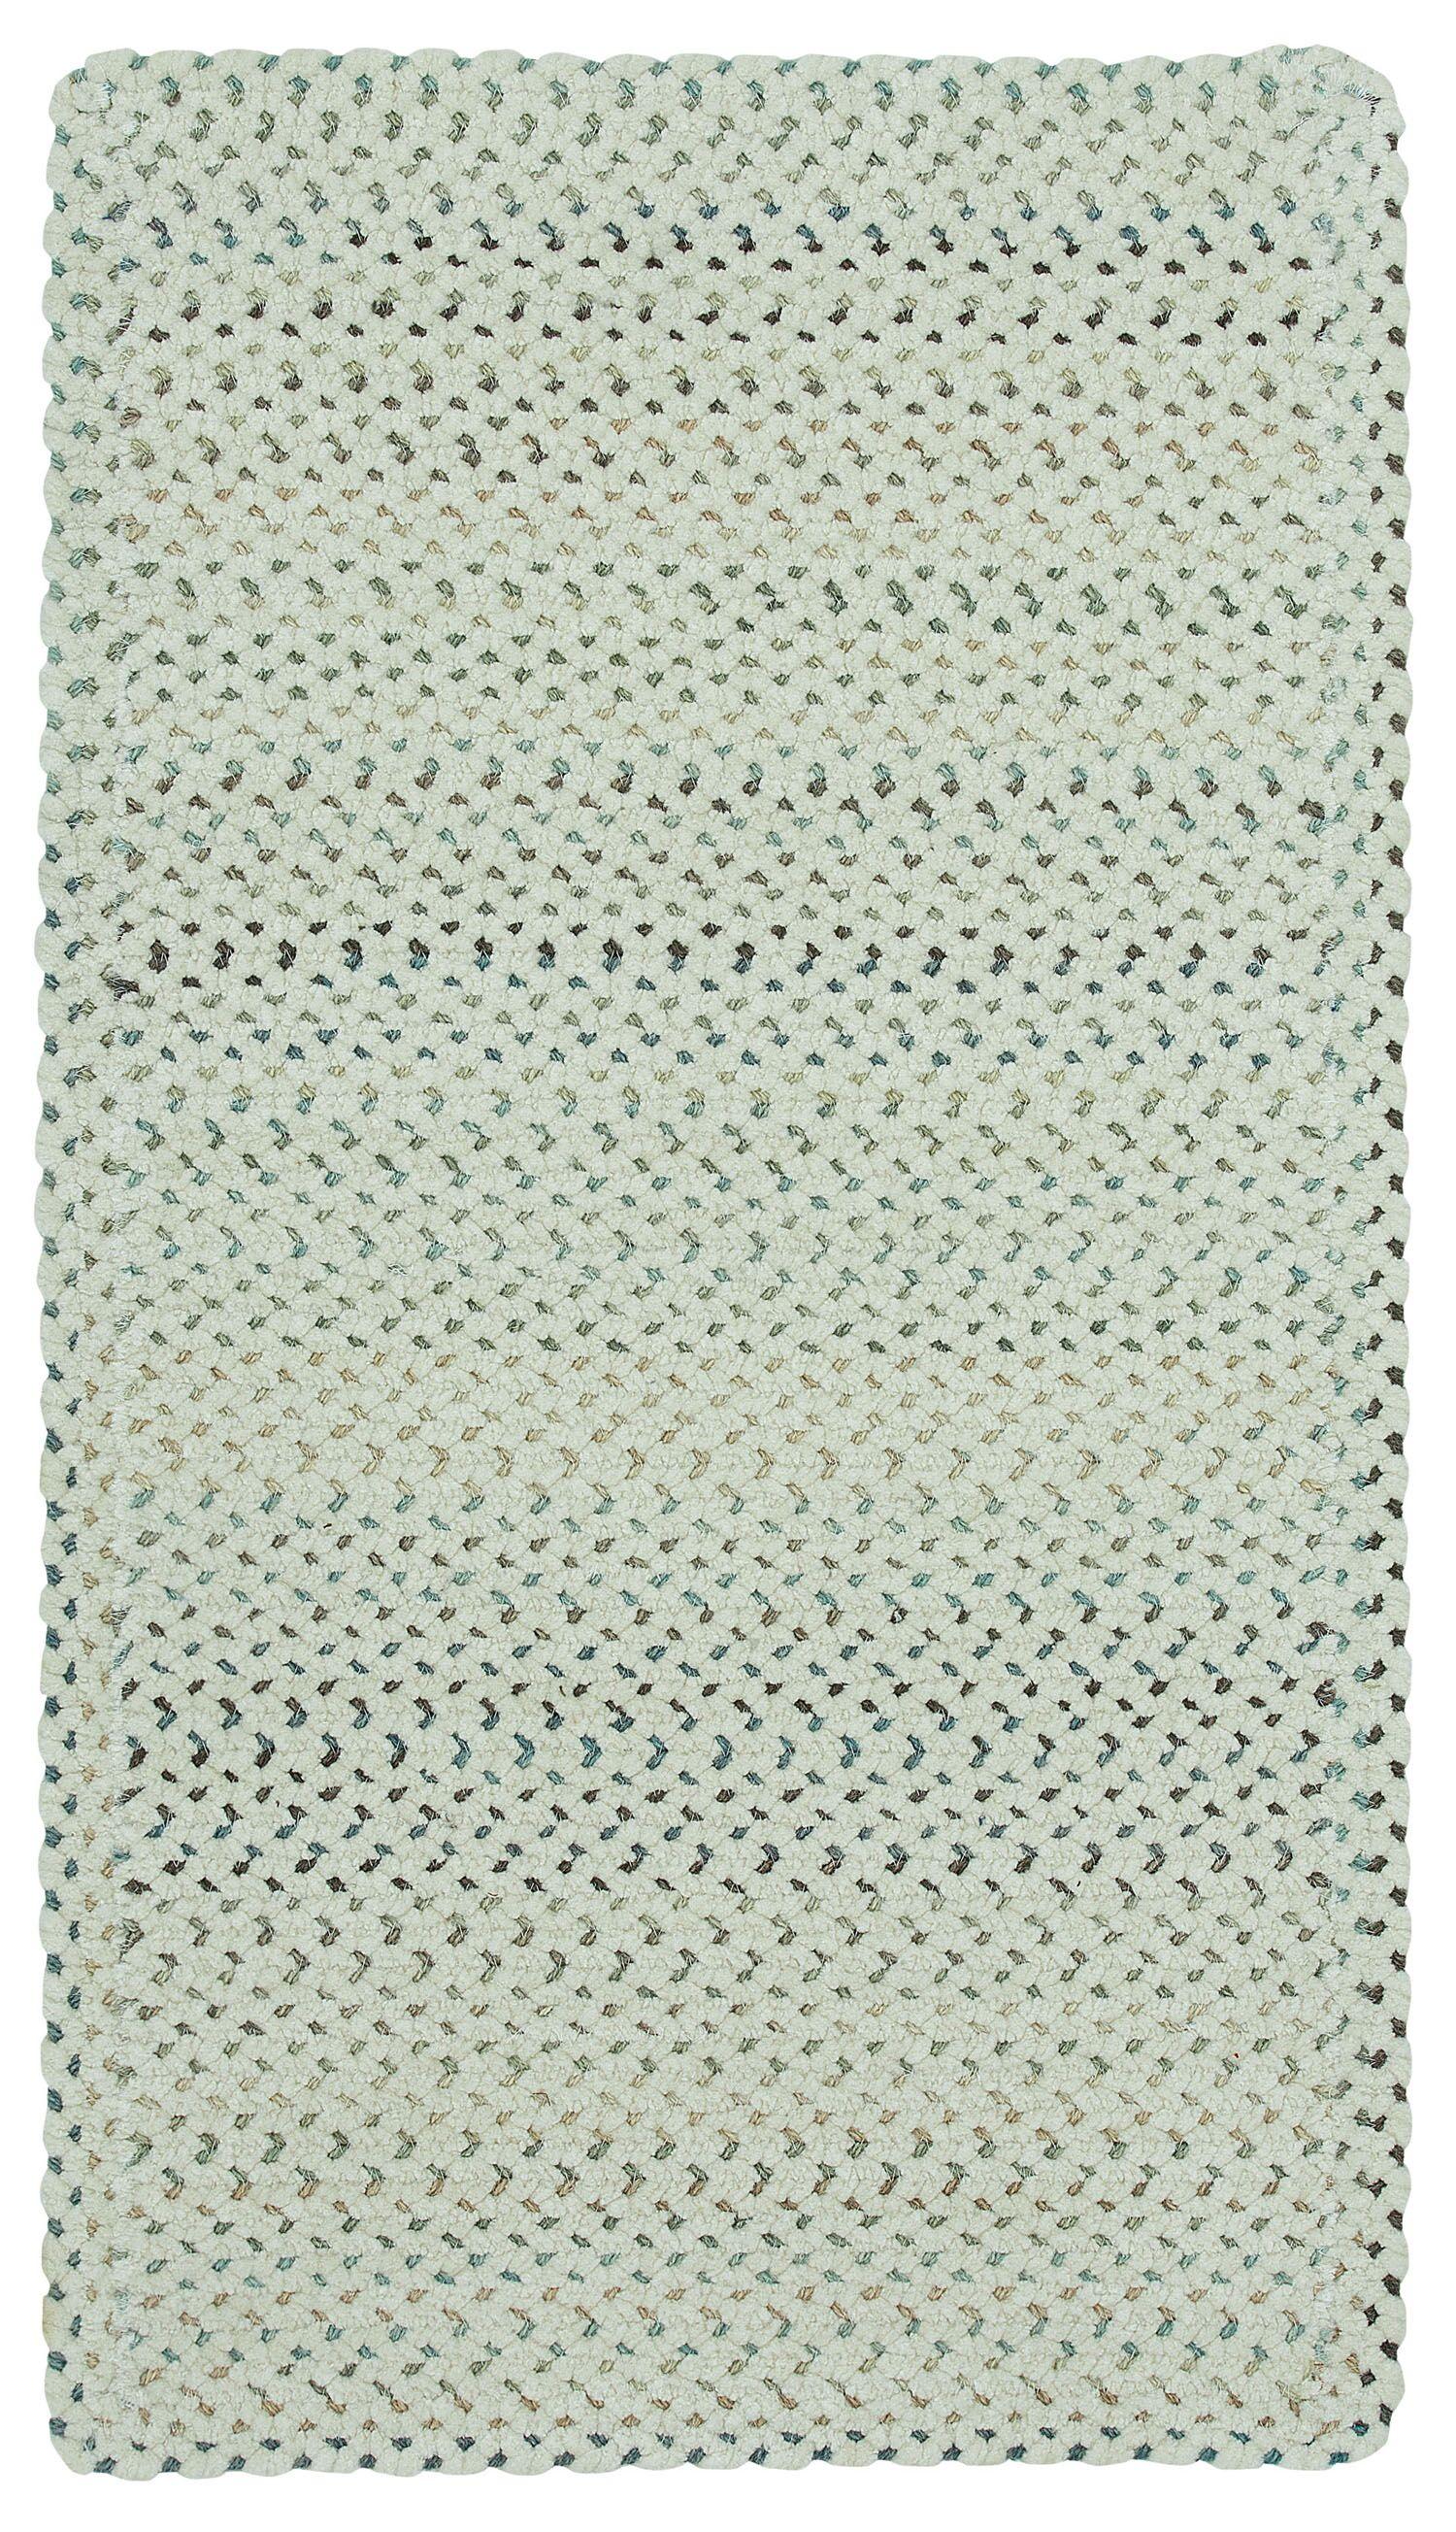 Vivid Cross Sewn Braided Eggshell Area Rug Rug Size: Rectangle 9'2